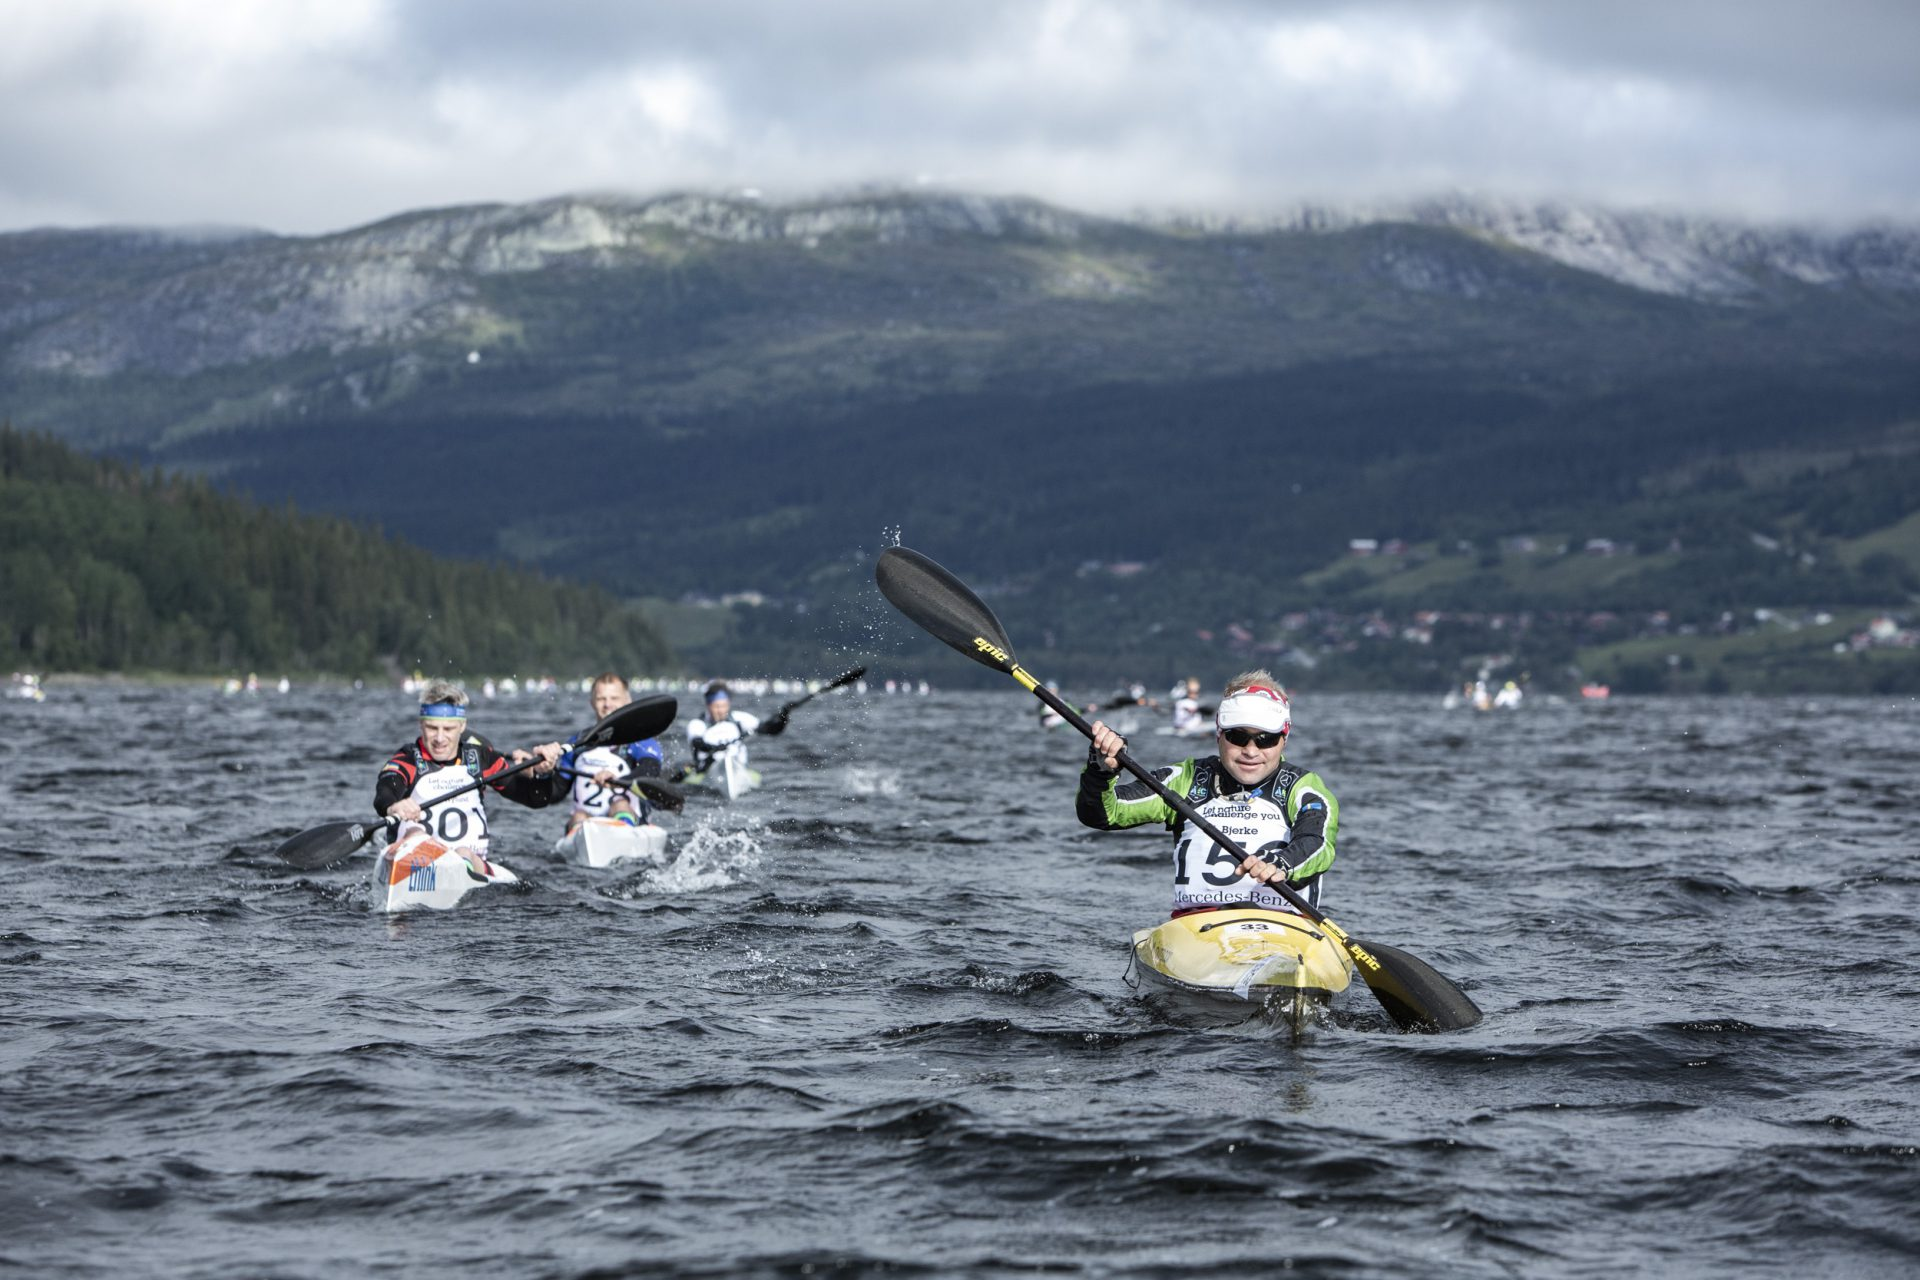 Åre Extreme Challenge paddling Håkan Wike